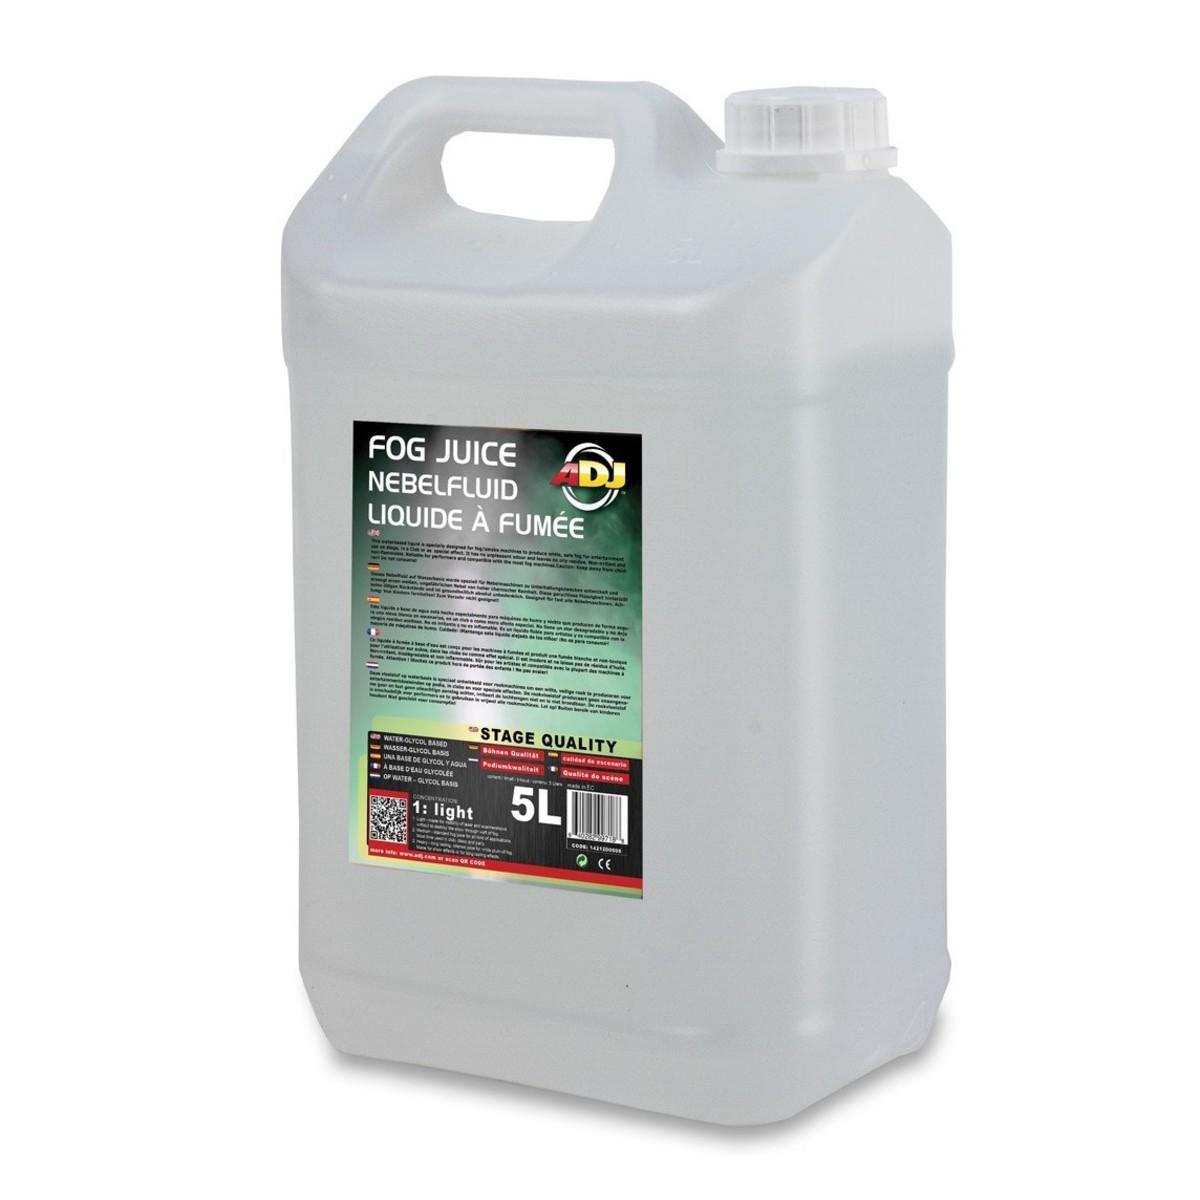 Image of ADJ Fog Juice 1 Light 5 Litre